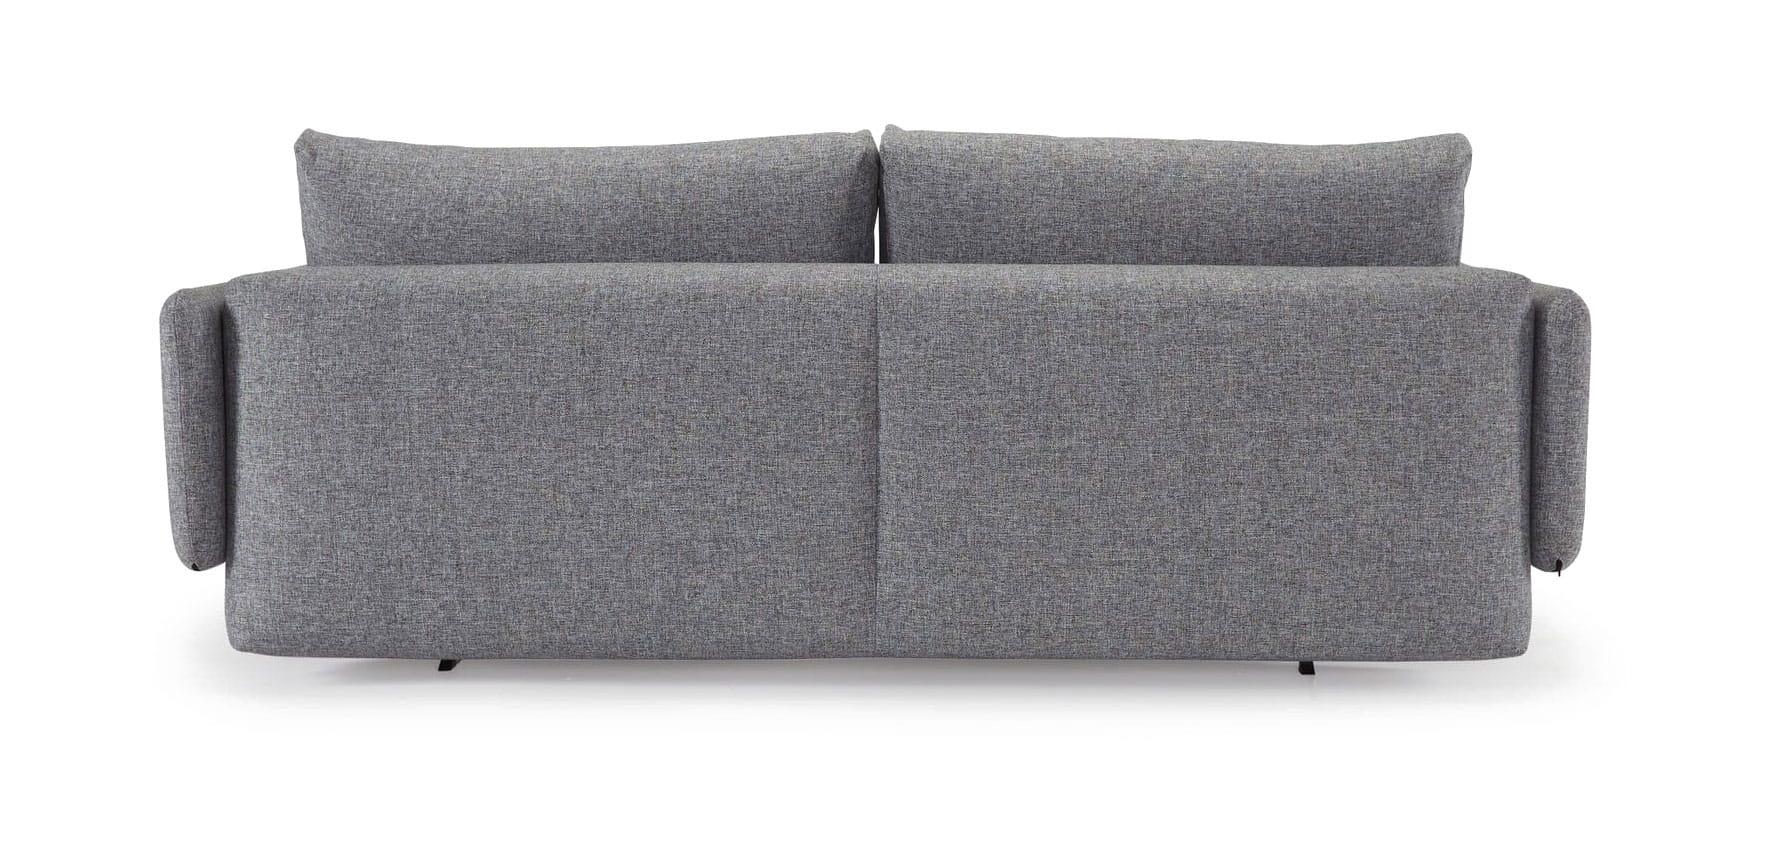 Super Frode Sofa W Walnut Arms Twist Granite By Innovation Inzonedesignstudio Interior Chair Design Inzonedesignstudiocom